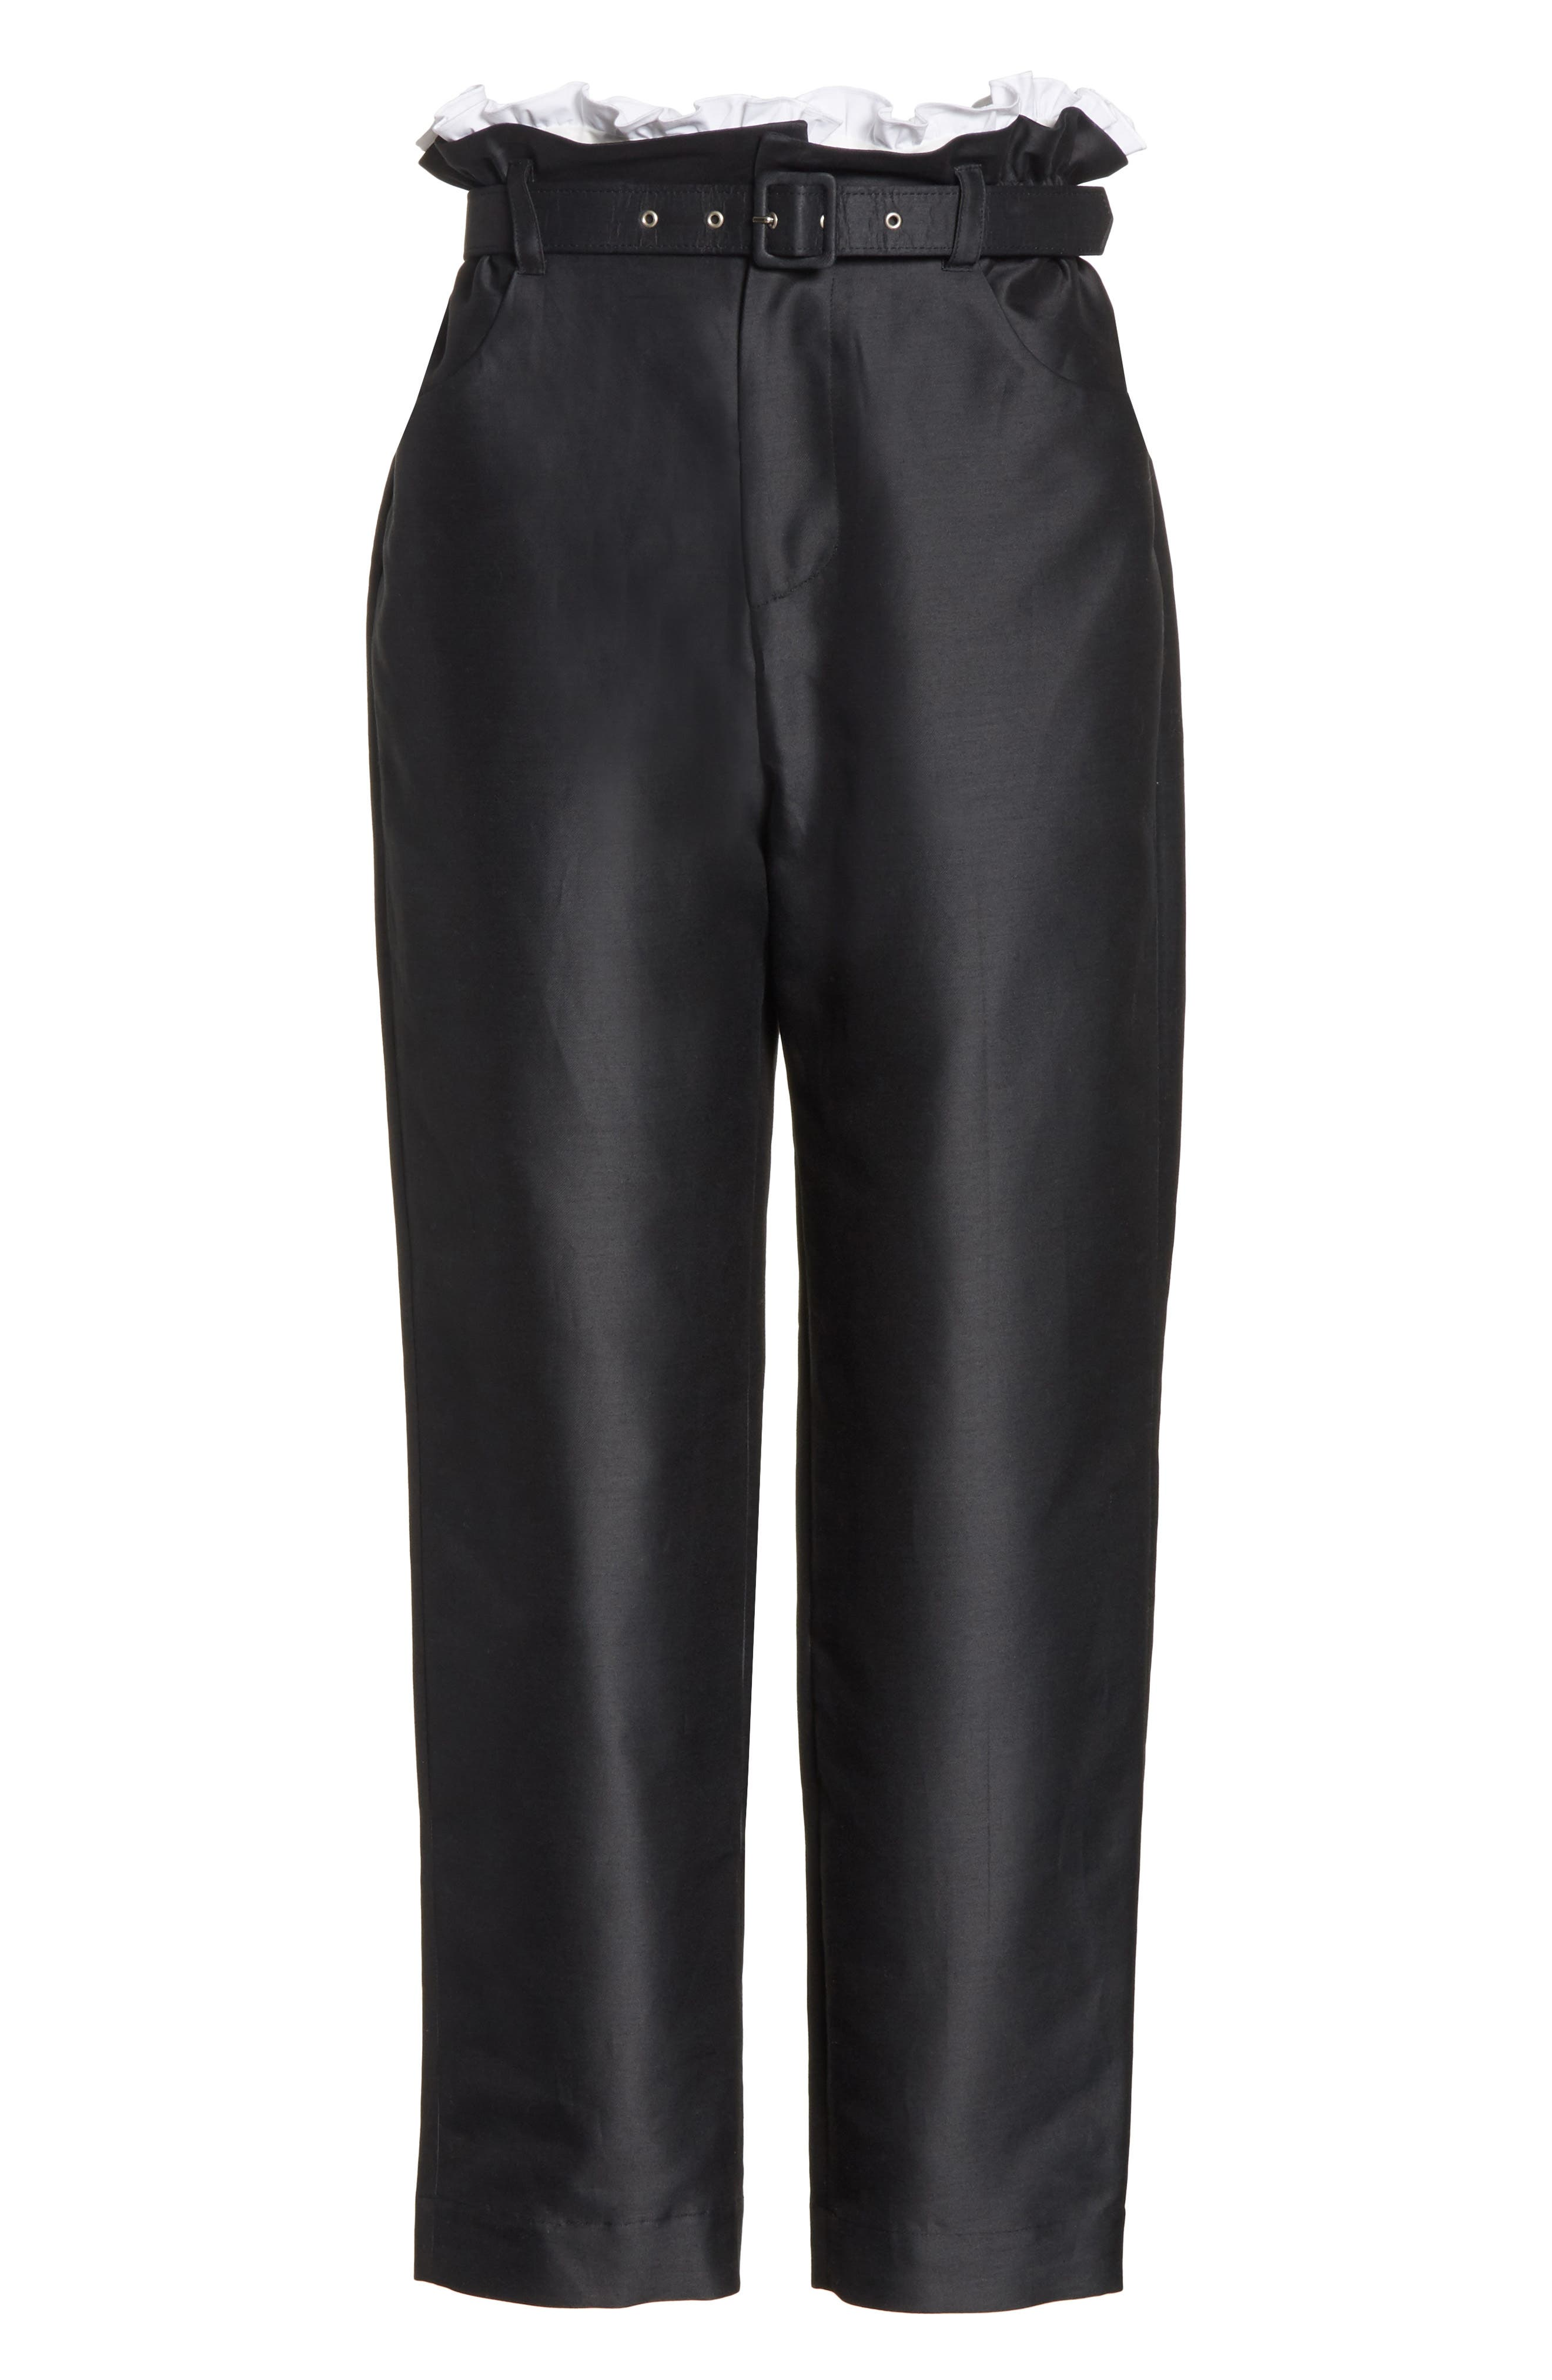 Paperbag Cotton & Silk Trousers,                             Alternate thumbnail 6, color,                             Black